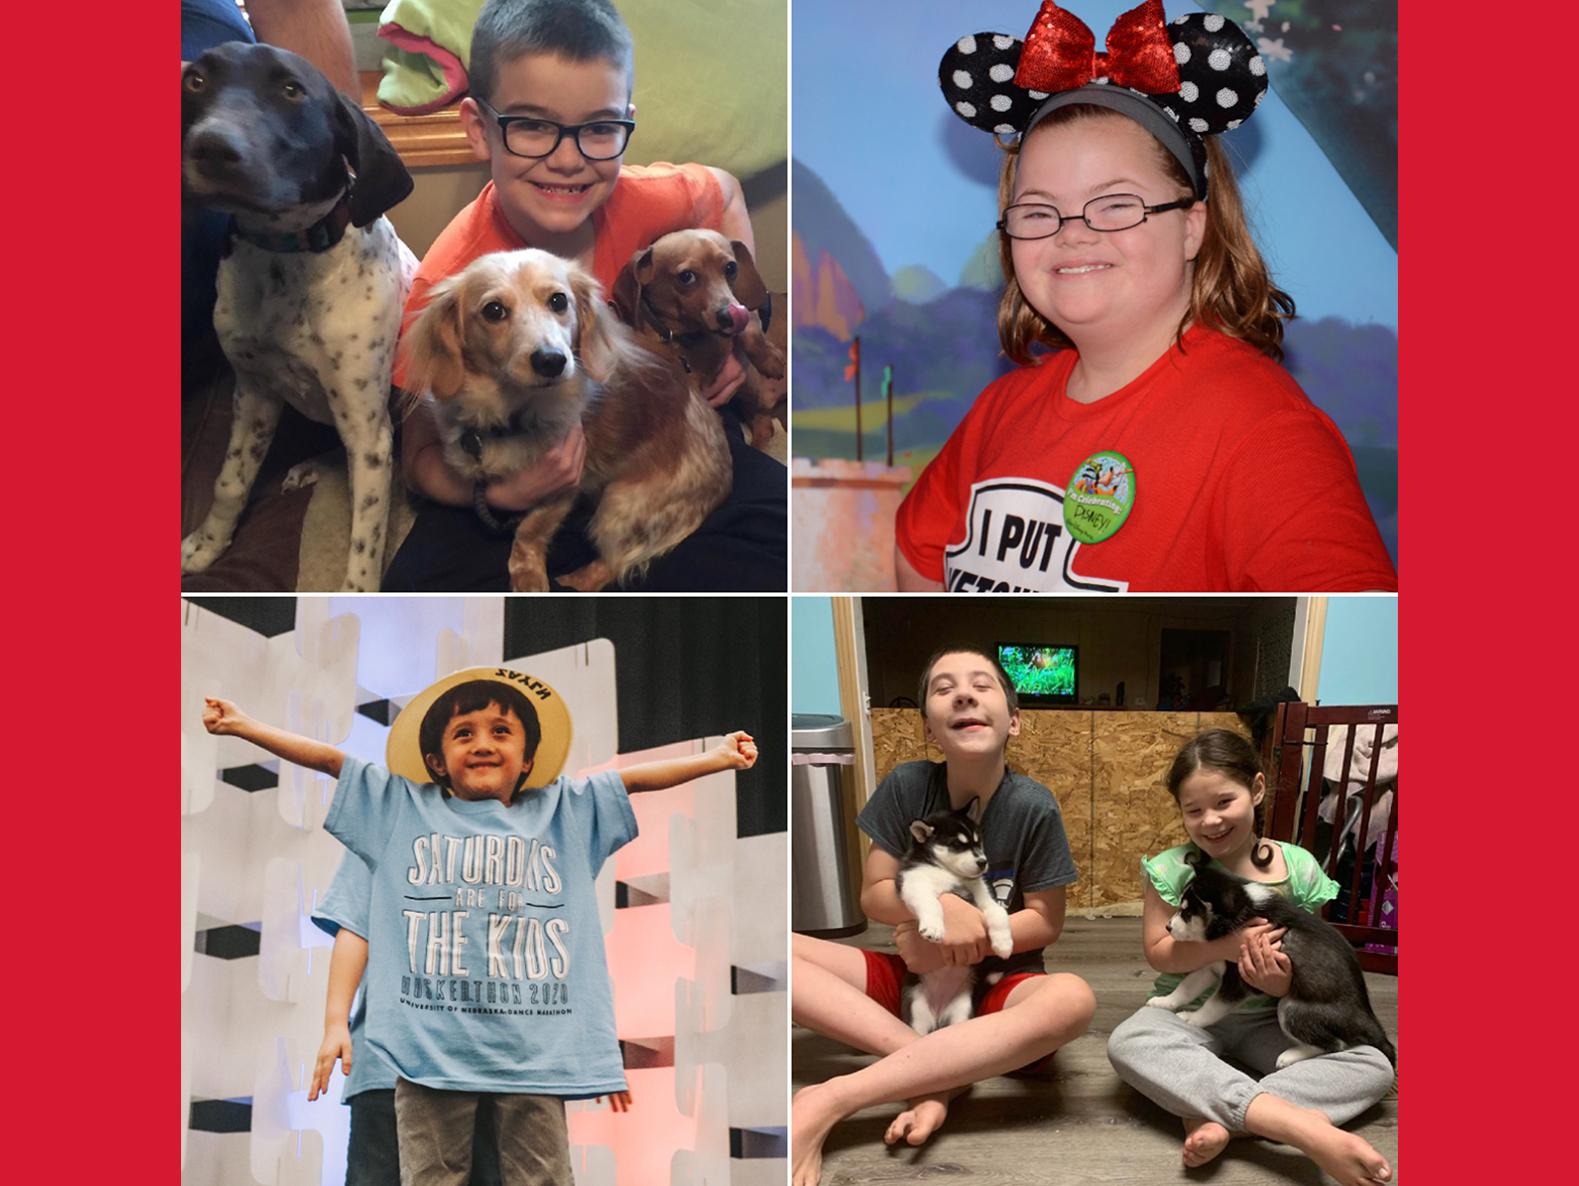 Dancing #FTK at the Univeristy of Nebraska–Lincoln Huskerthon has benefitted children like Kaden, Anna, Zayln, Bradyn & Chloe.